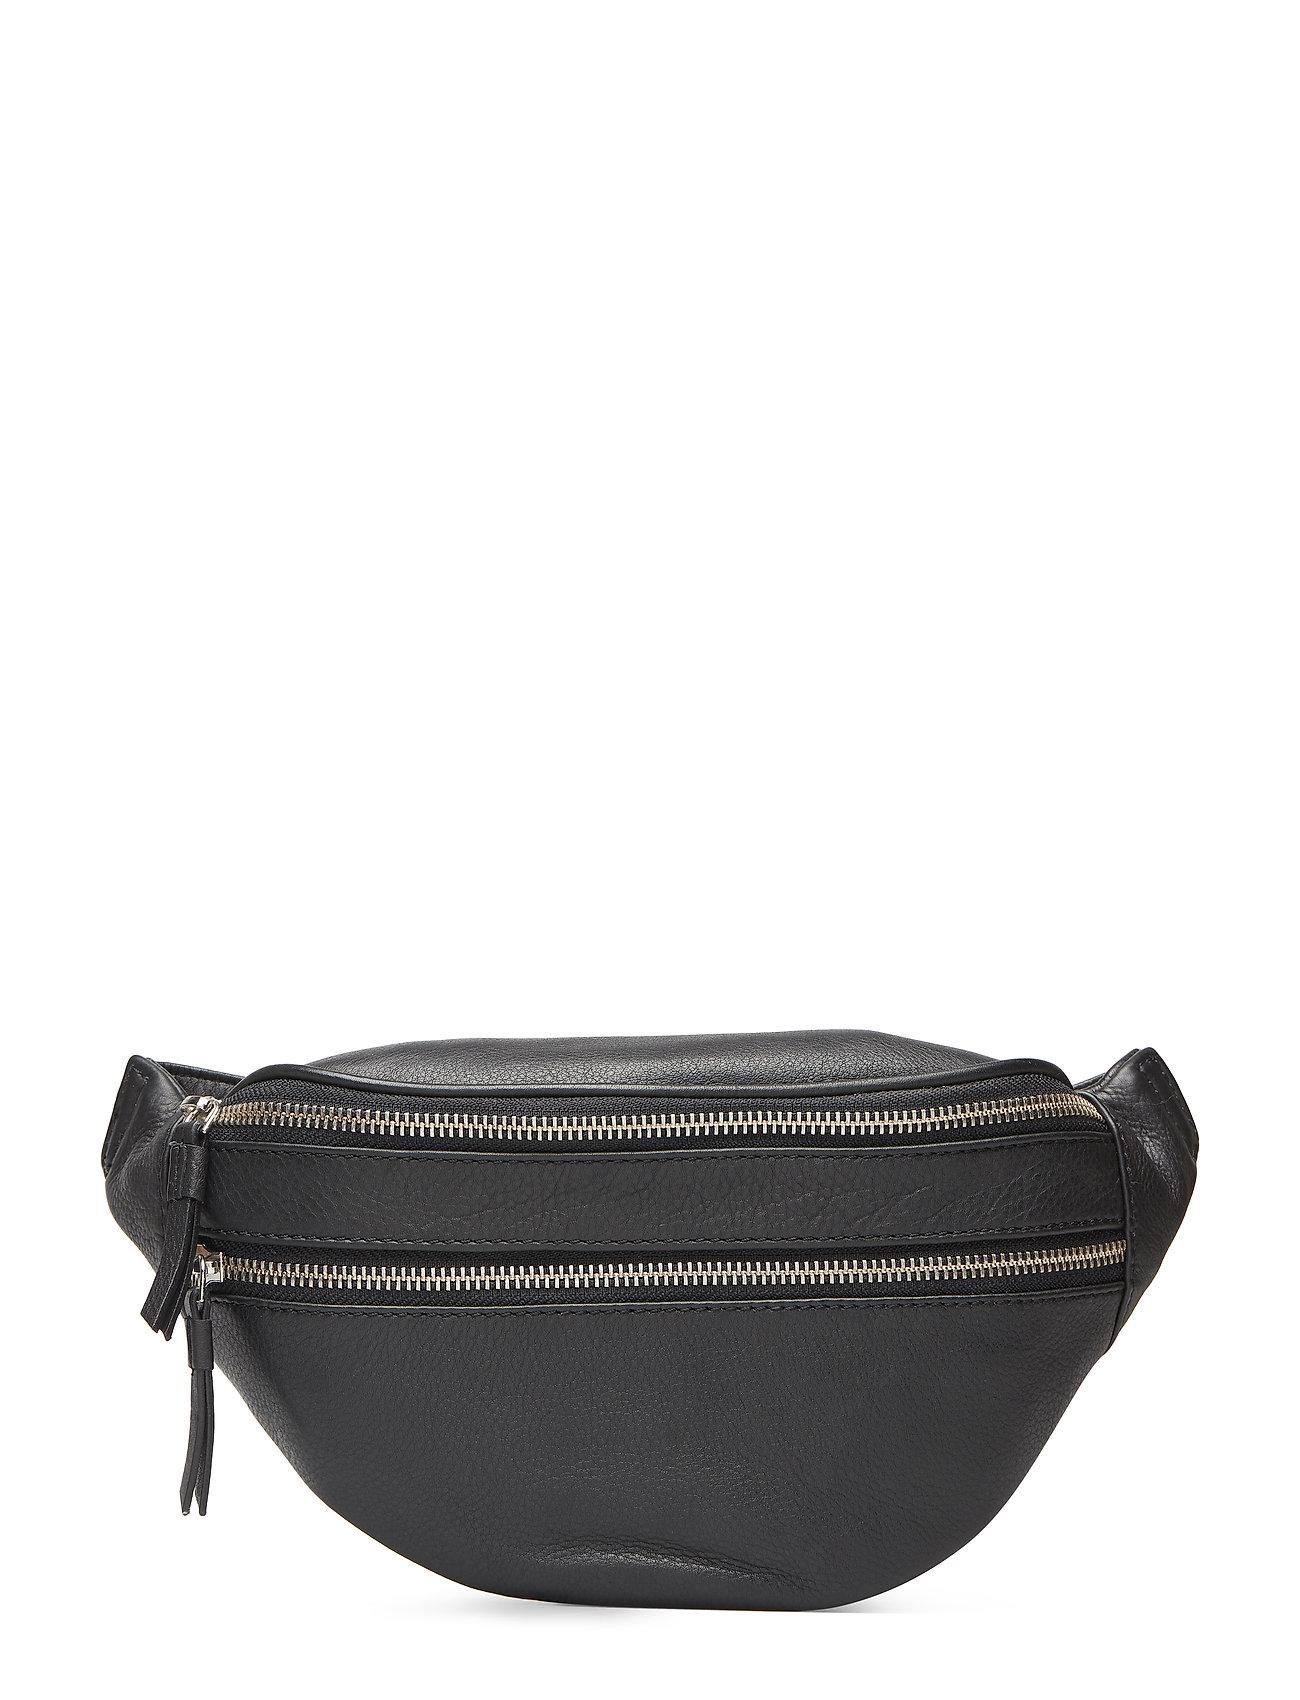 Markberg Becca Bum Bag - BLACK